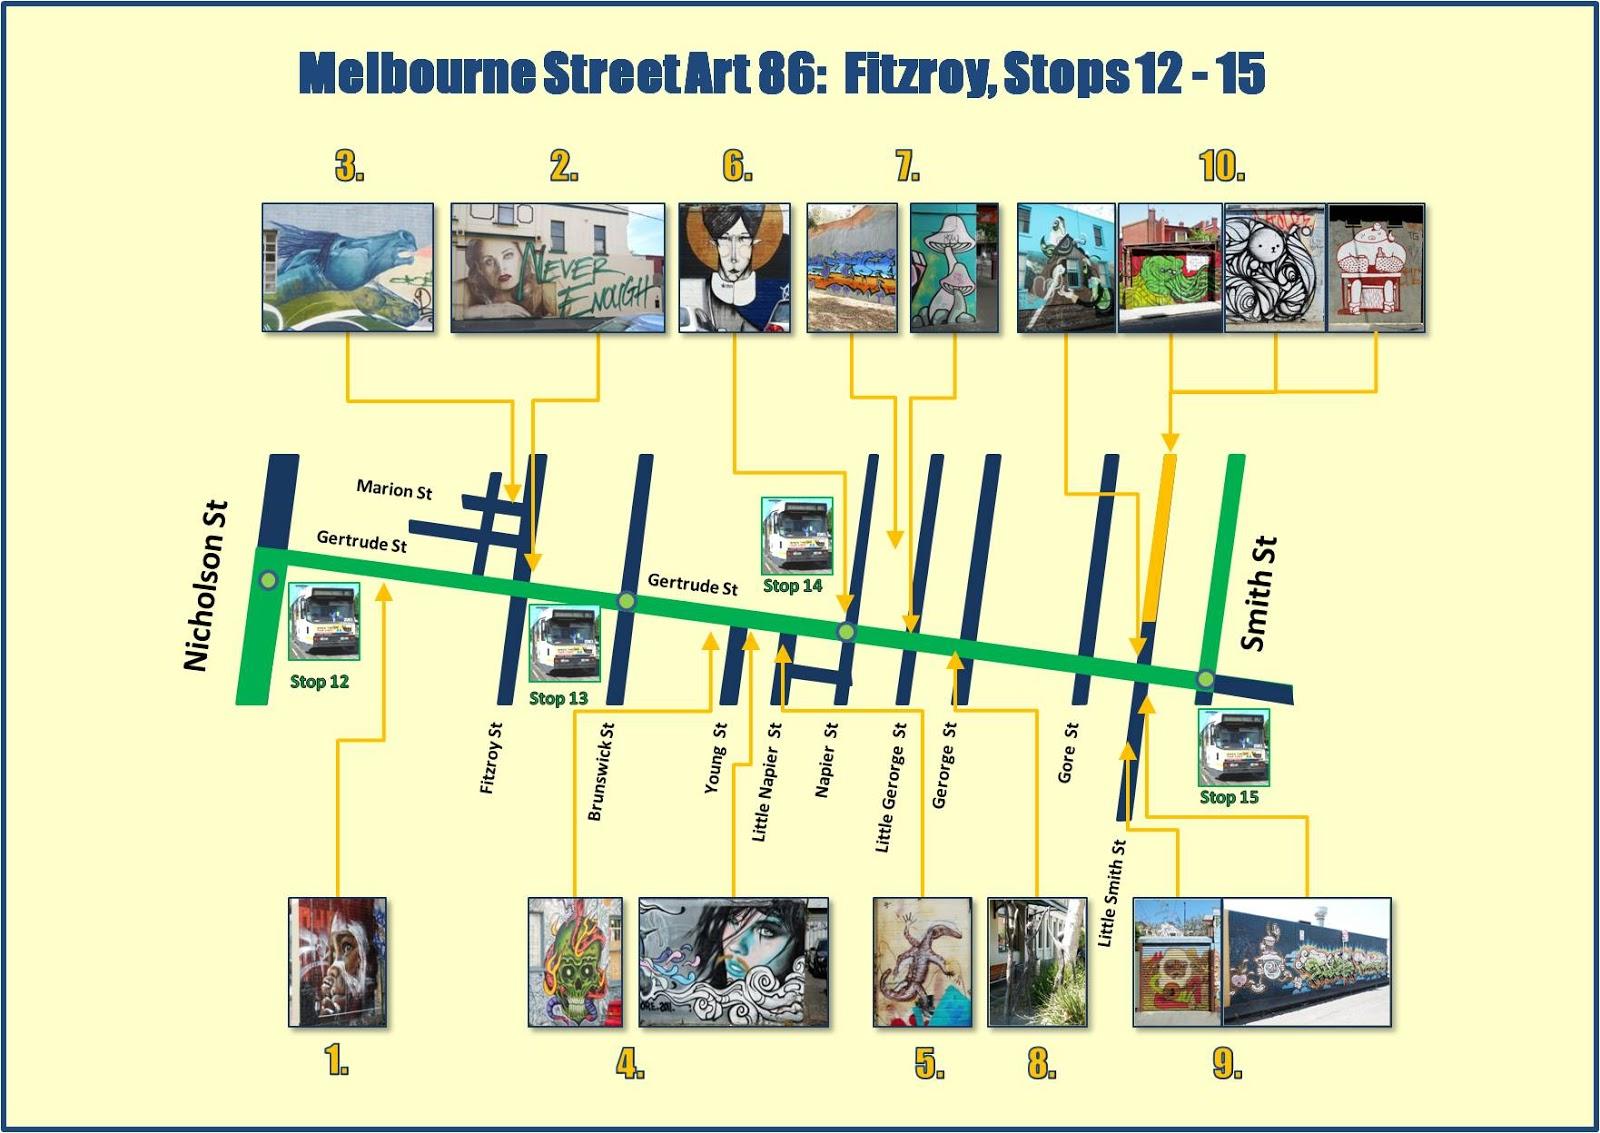 Melbourne Street Art Map Melbourne Street Art 86: FITZROY   Gertrude St Melbourne Street Art Map